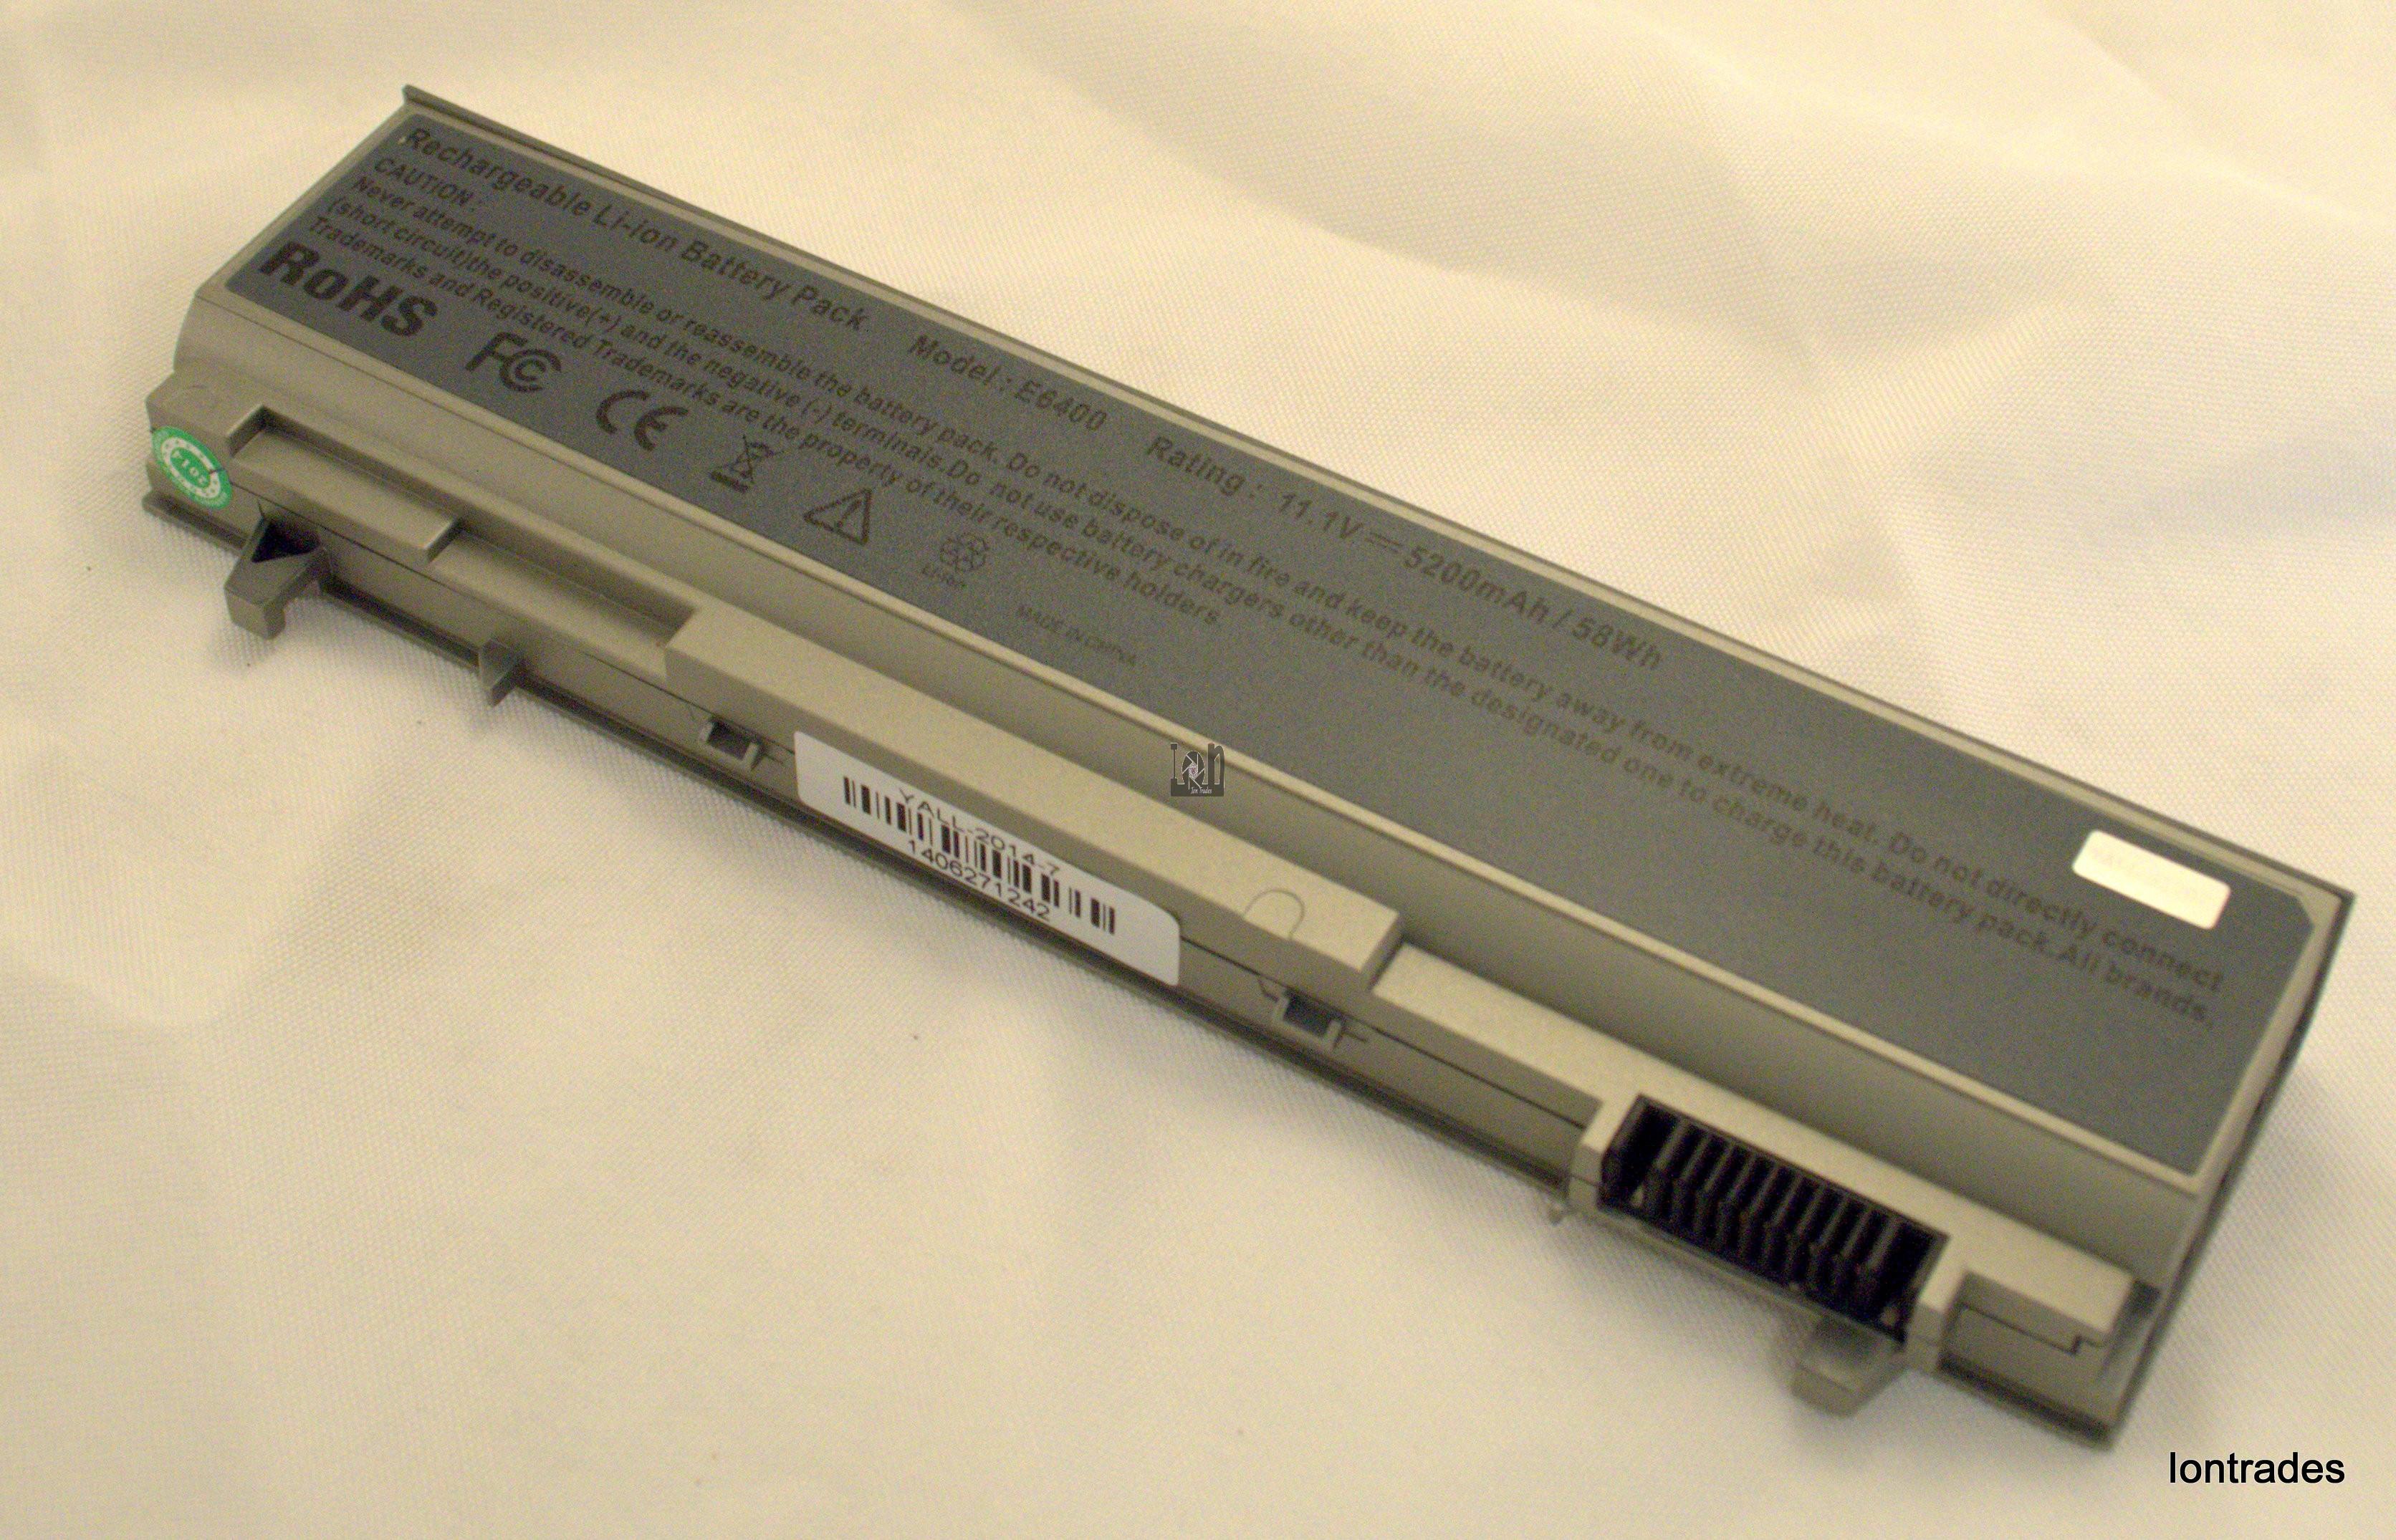 E64000 5200mAh Battery Replacement for Dell Latitude M2400 M4400